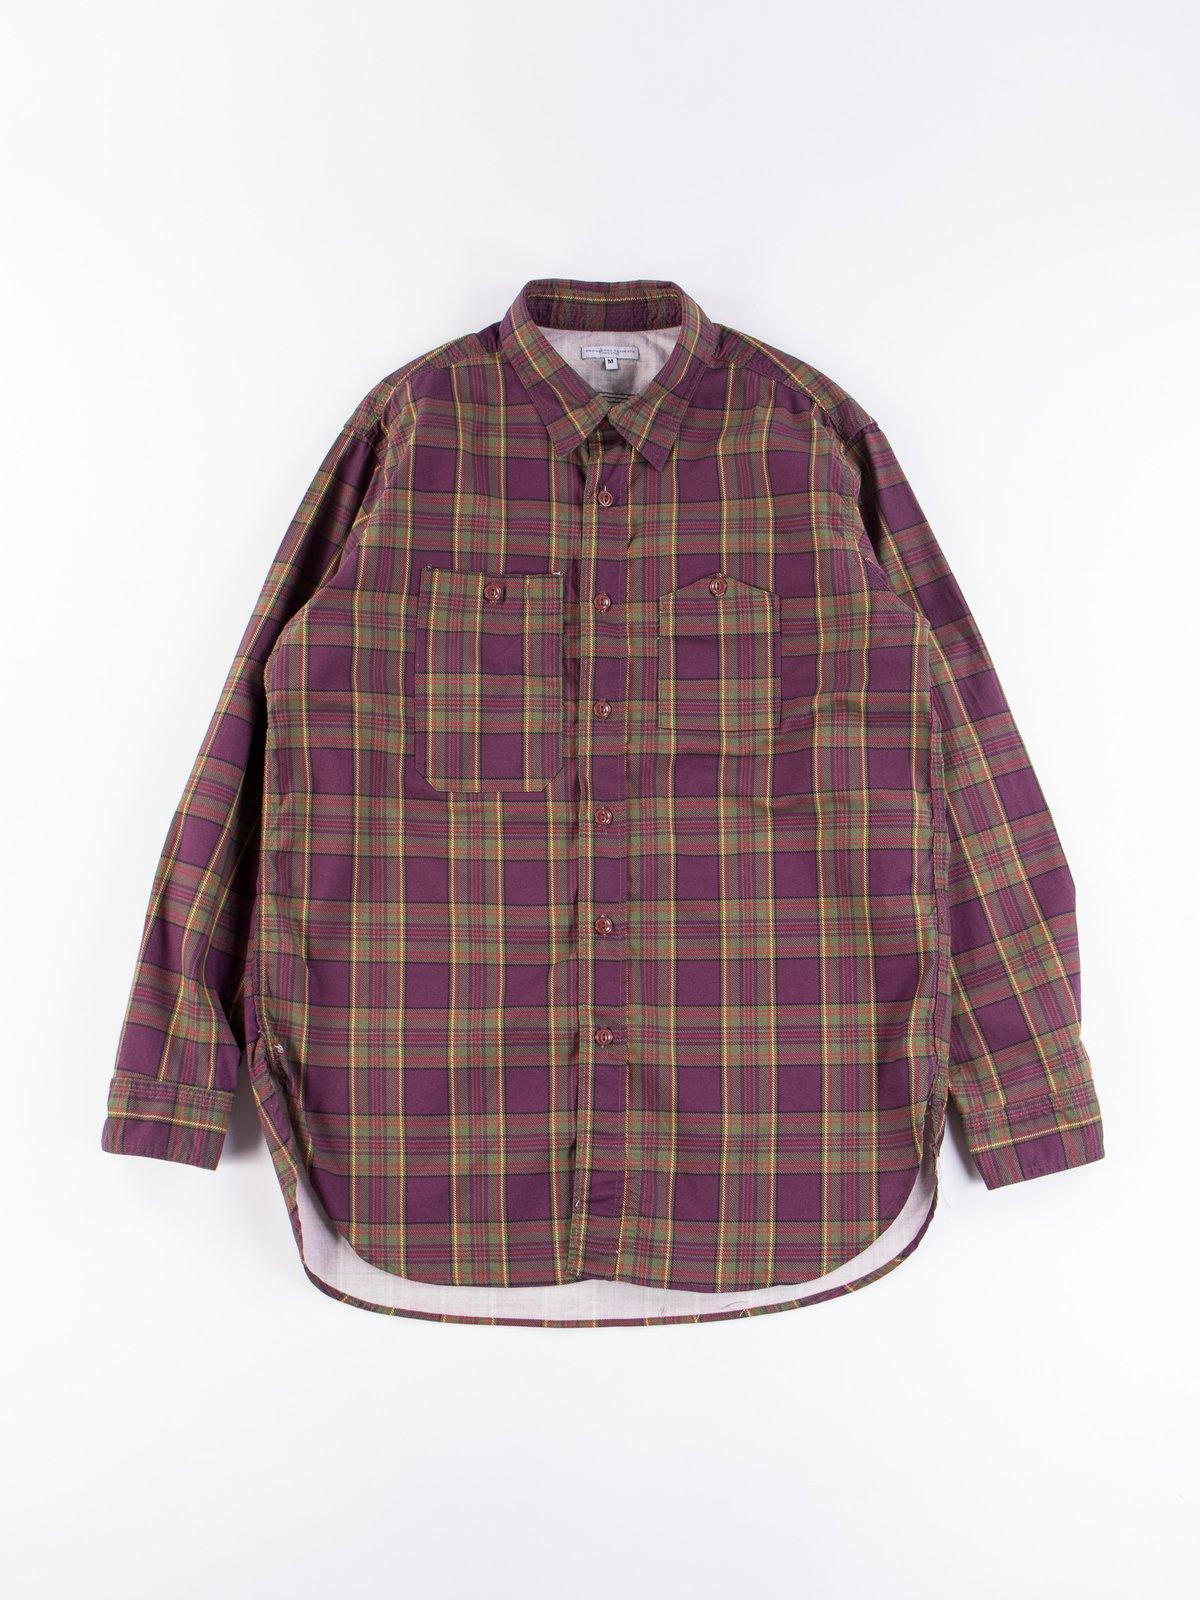 Purple/Green Cotton Printed Plaid Work Shirt - Image 1